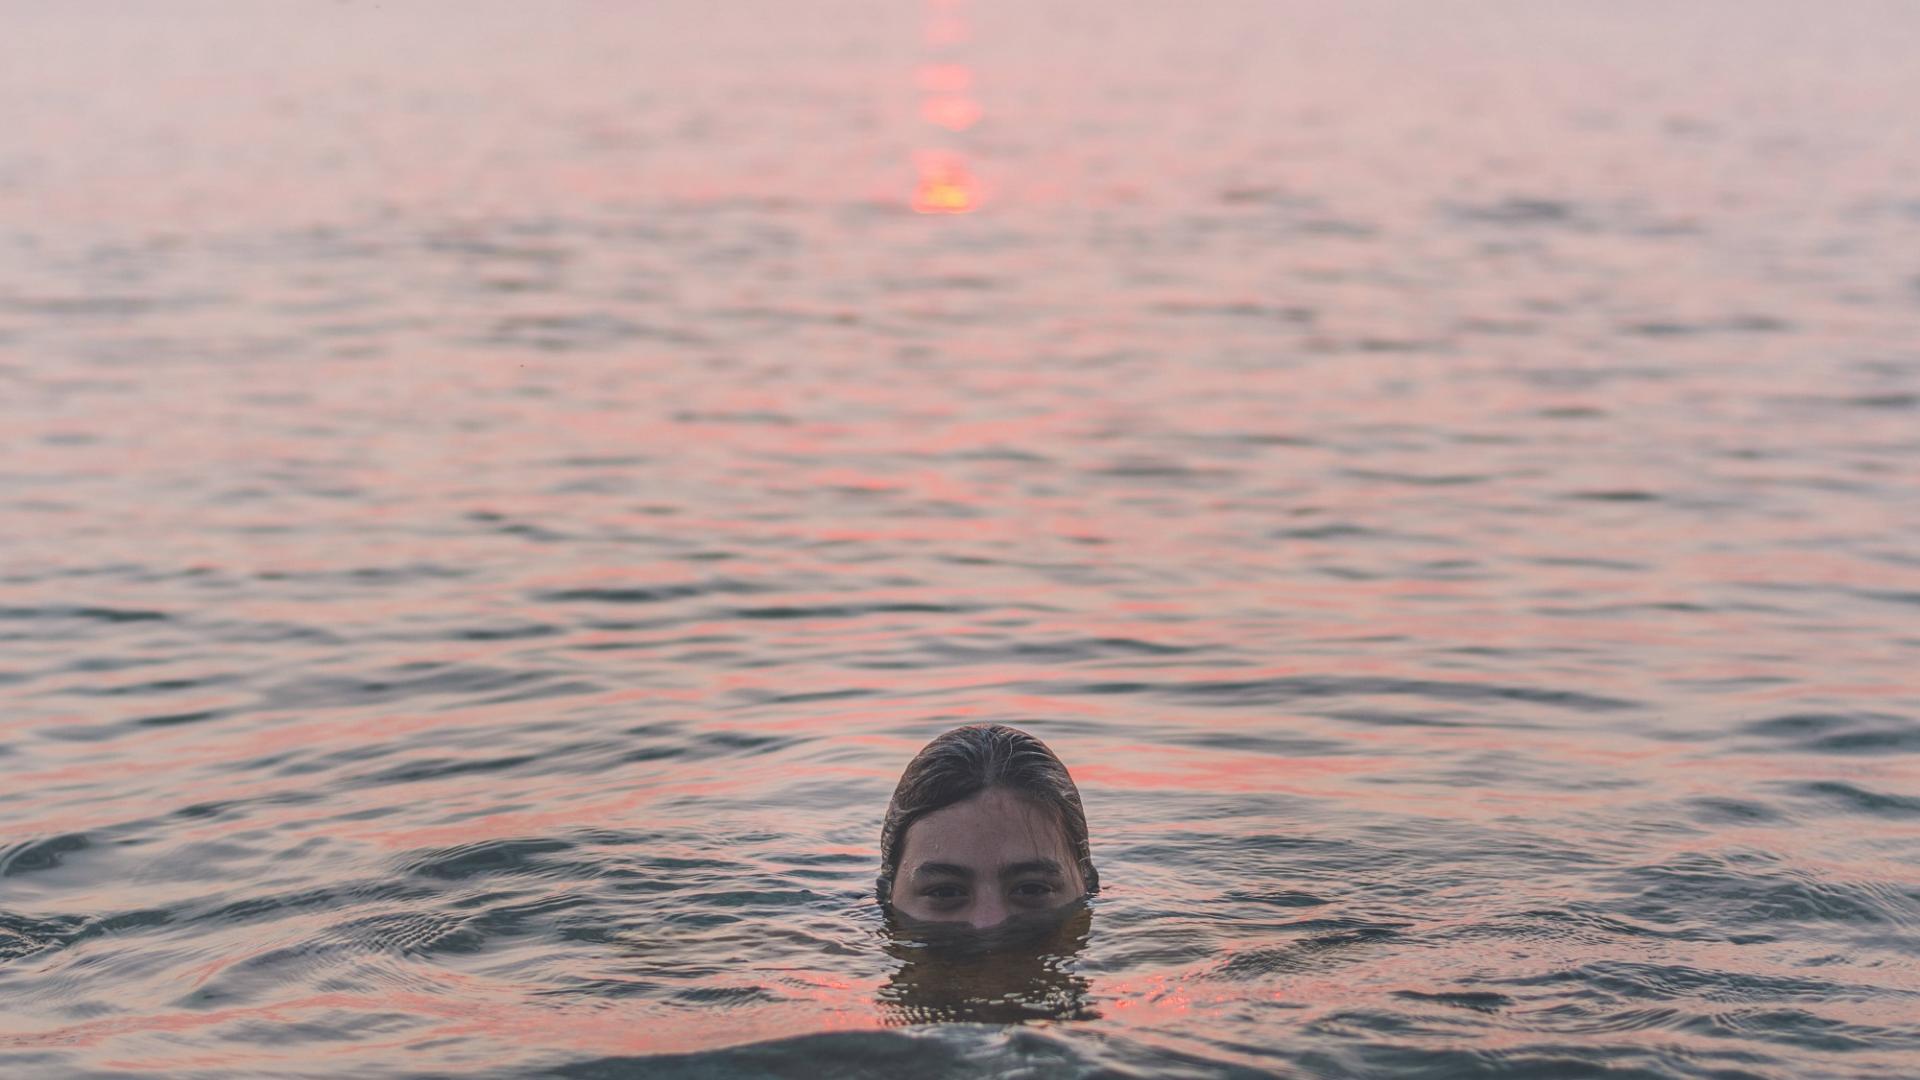 Frau, Meer, Wasser, Sonnenuntergang